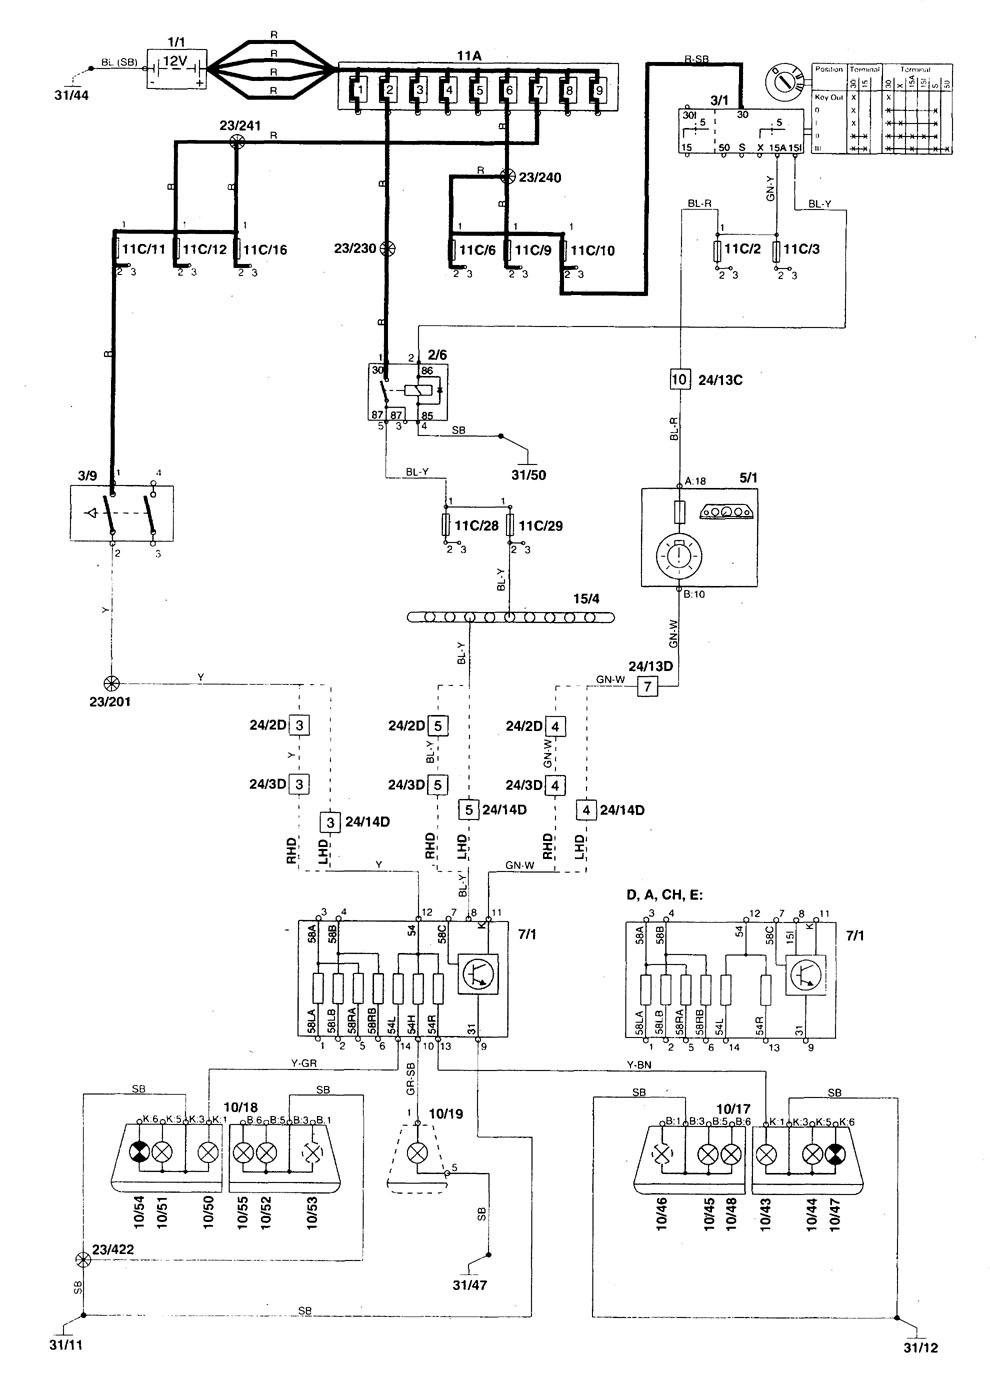 medium resolution of 2000 volvo s70 wiring diagram trusted wiring diagram volvo s40 fuse box 1999 volvo s80 fuse